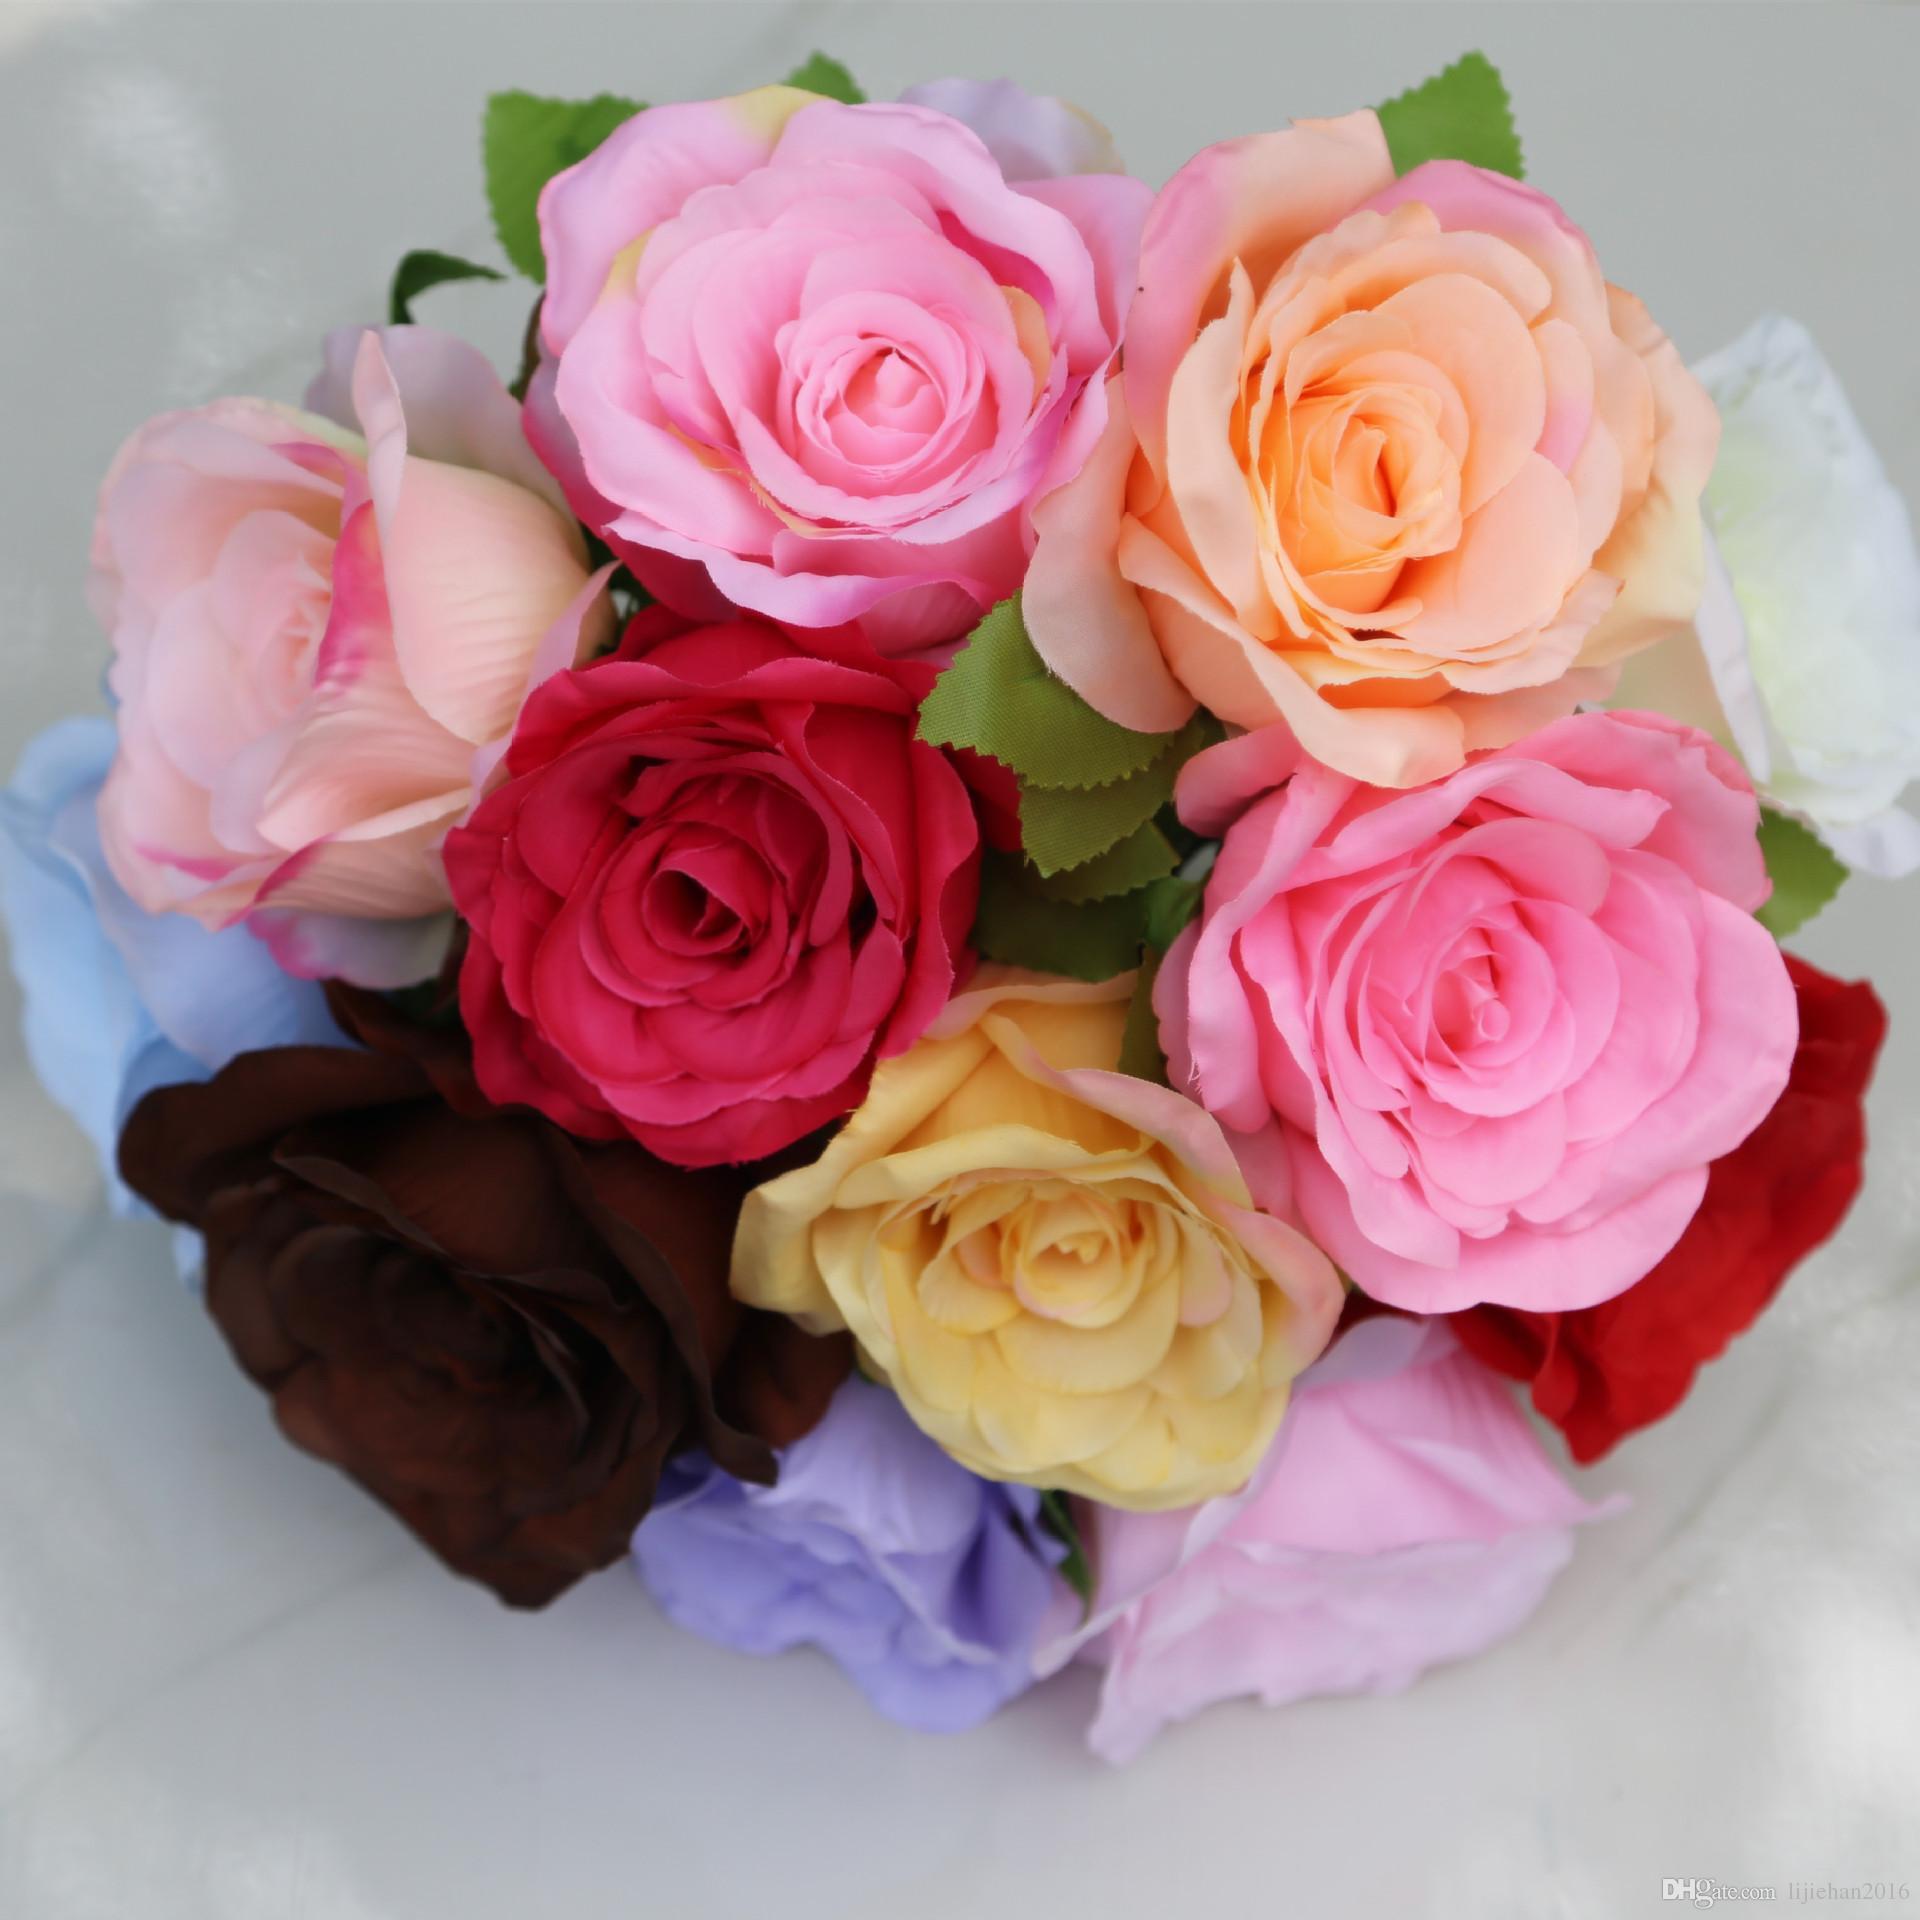 Best Artificial Flowers Silk Roses Bouquet Home Wedding Decoration Pack 24 Colour Select Hb 032 Under $0 51